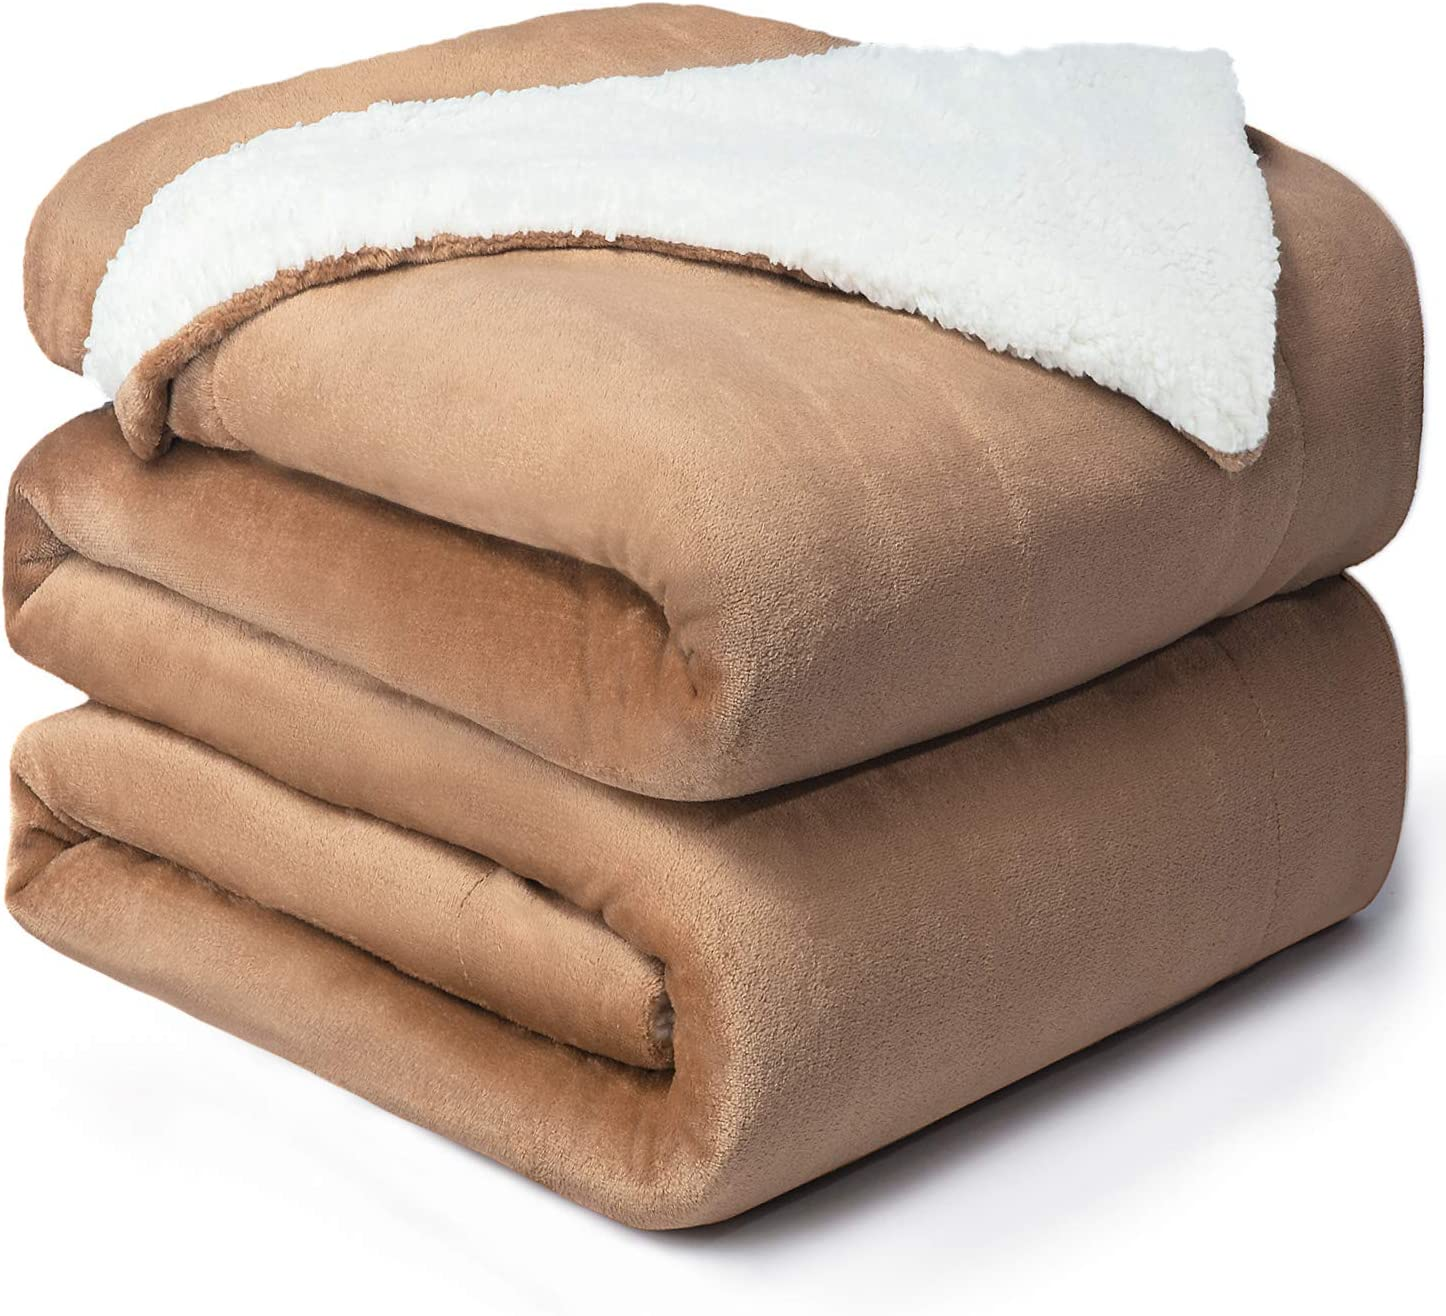 Bedsure Sherpa Fleece Blanket Queen Size Taupe Plush Blanket Fuzzy Soft Blanket Microfiber